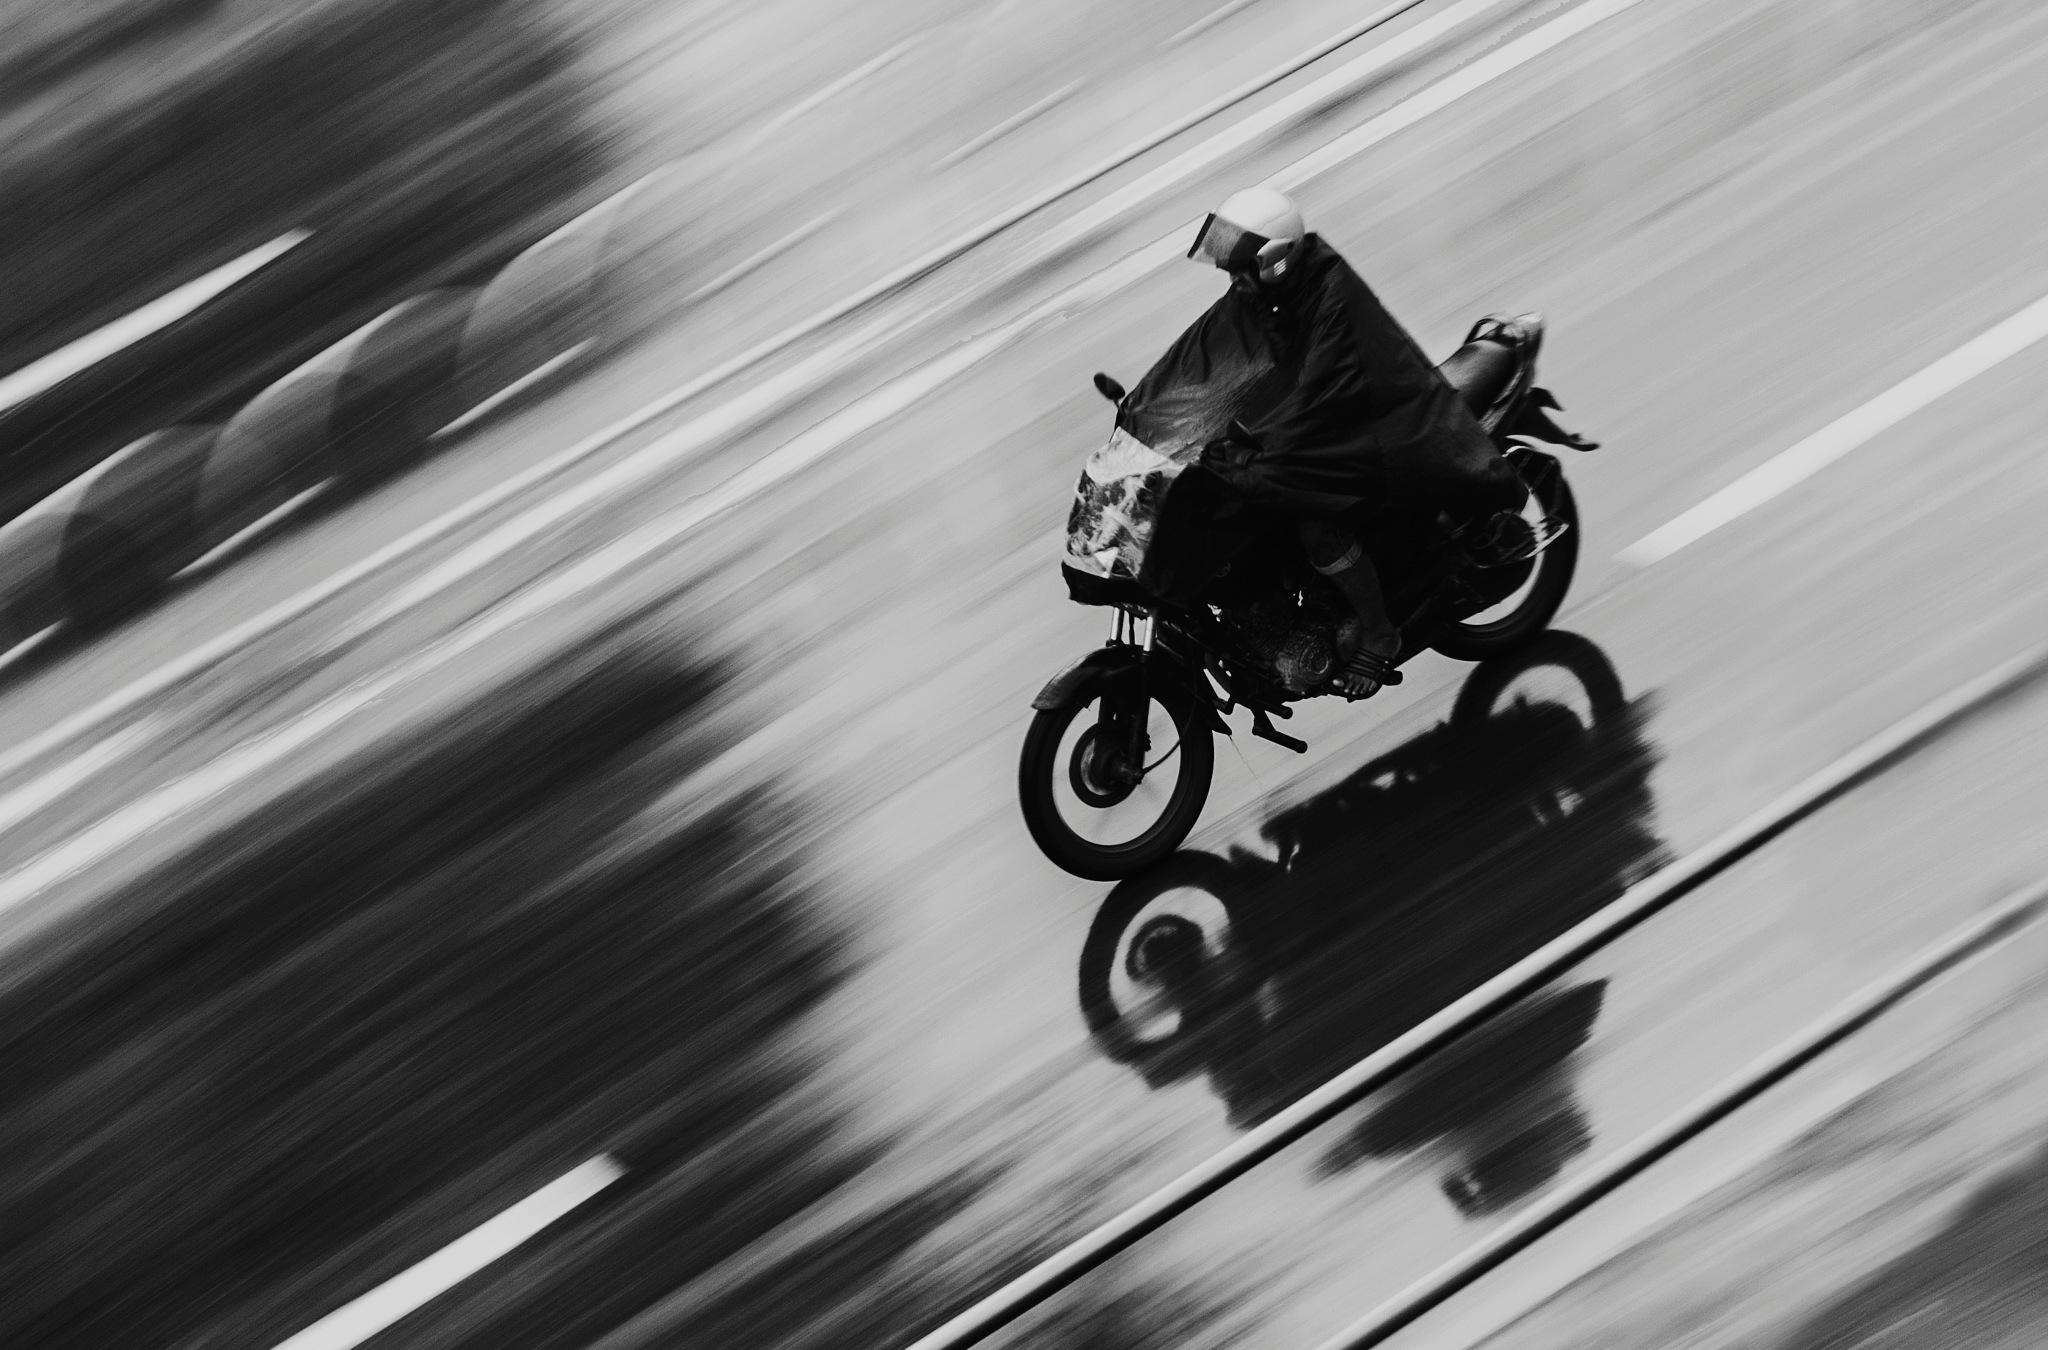 Ride  by Pranishan Rajbhandari